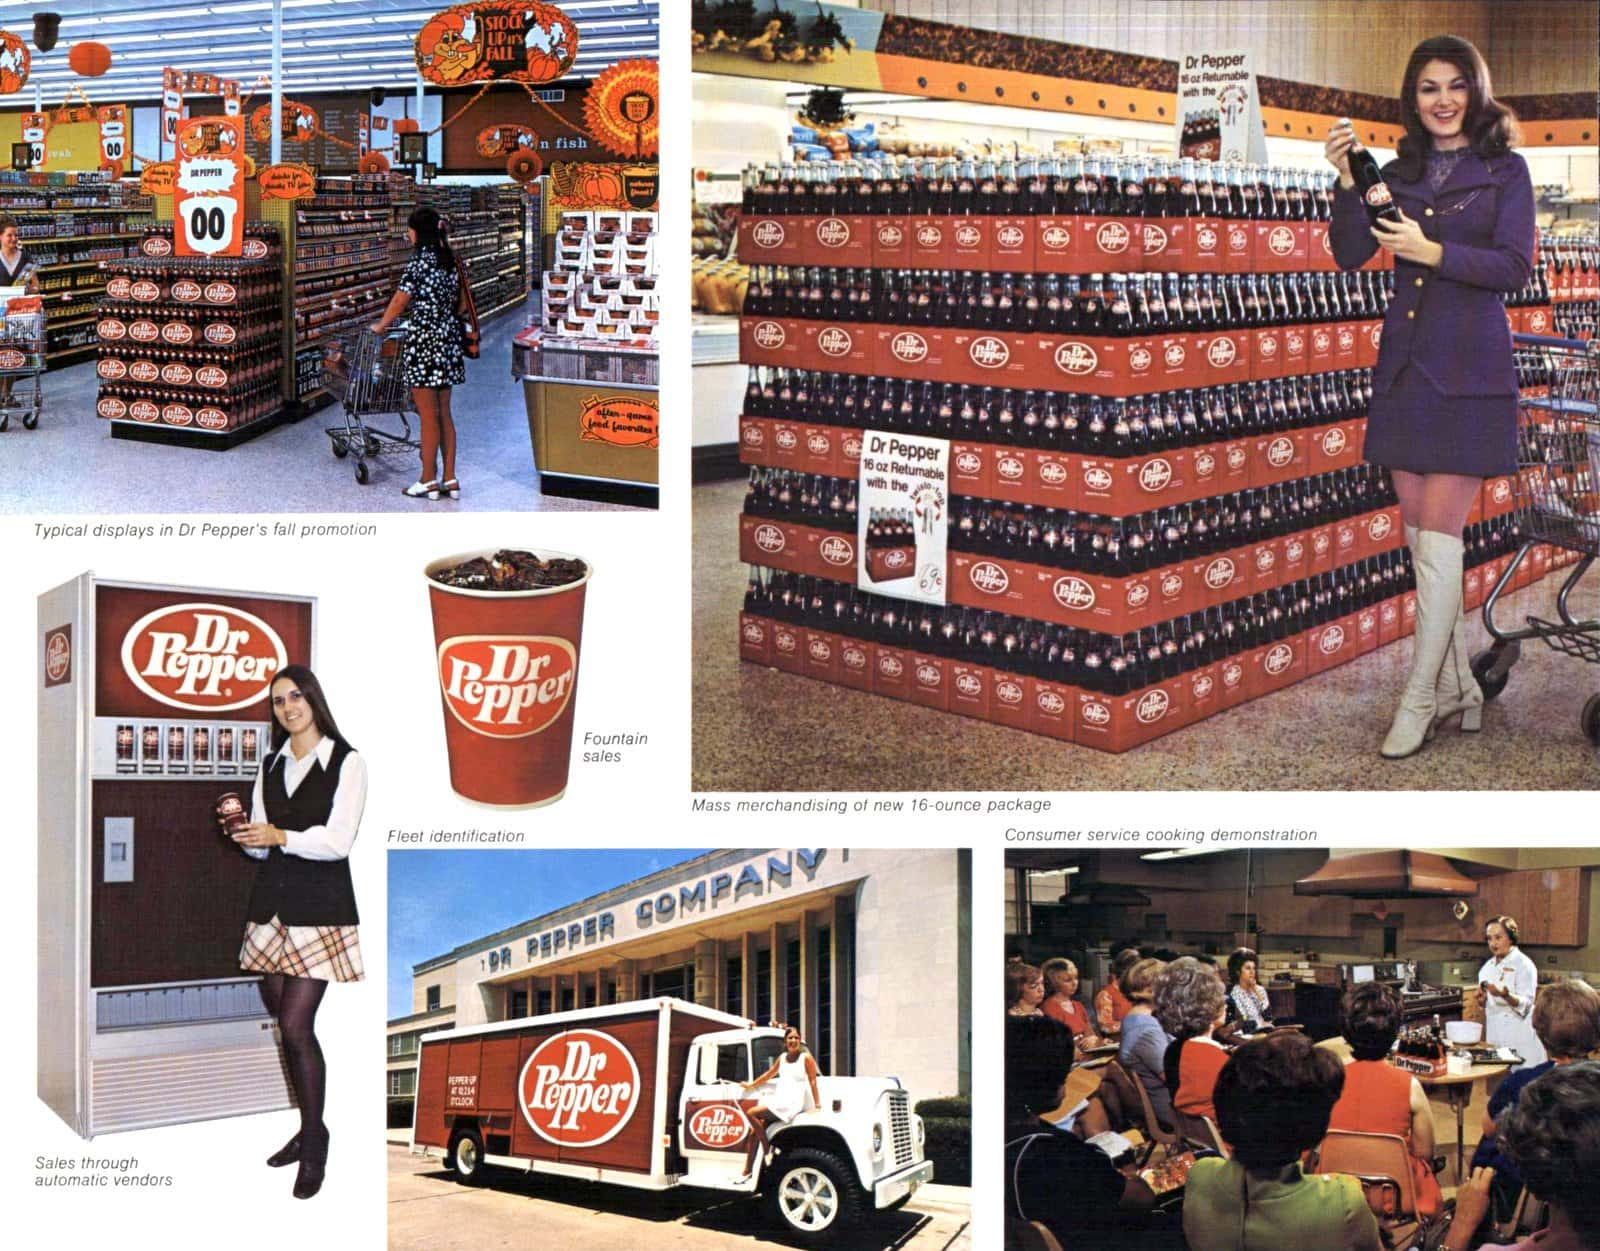 Marketing Dr Pepper (1971)